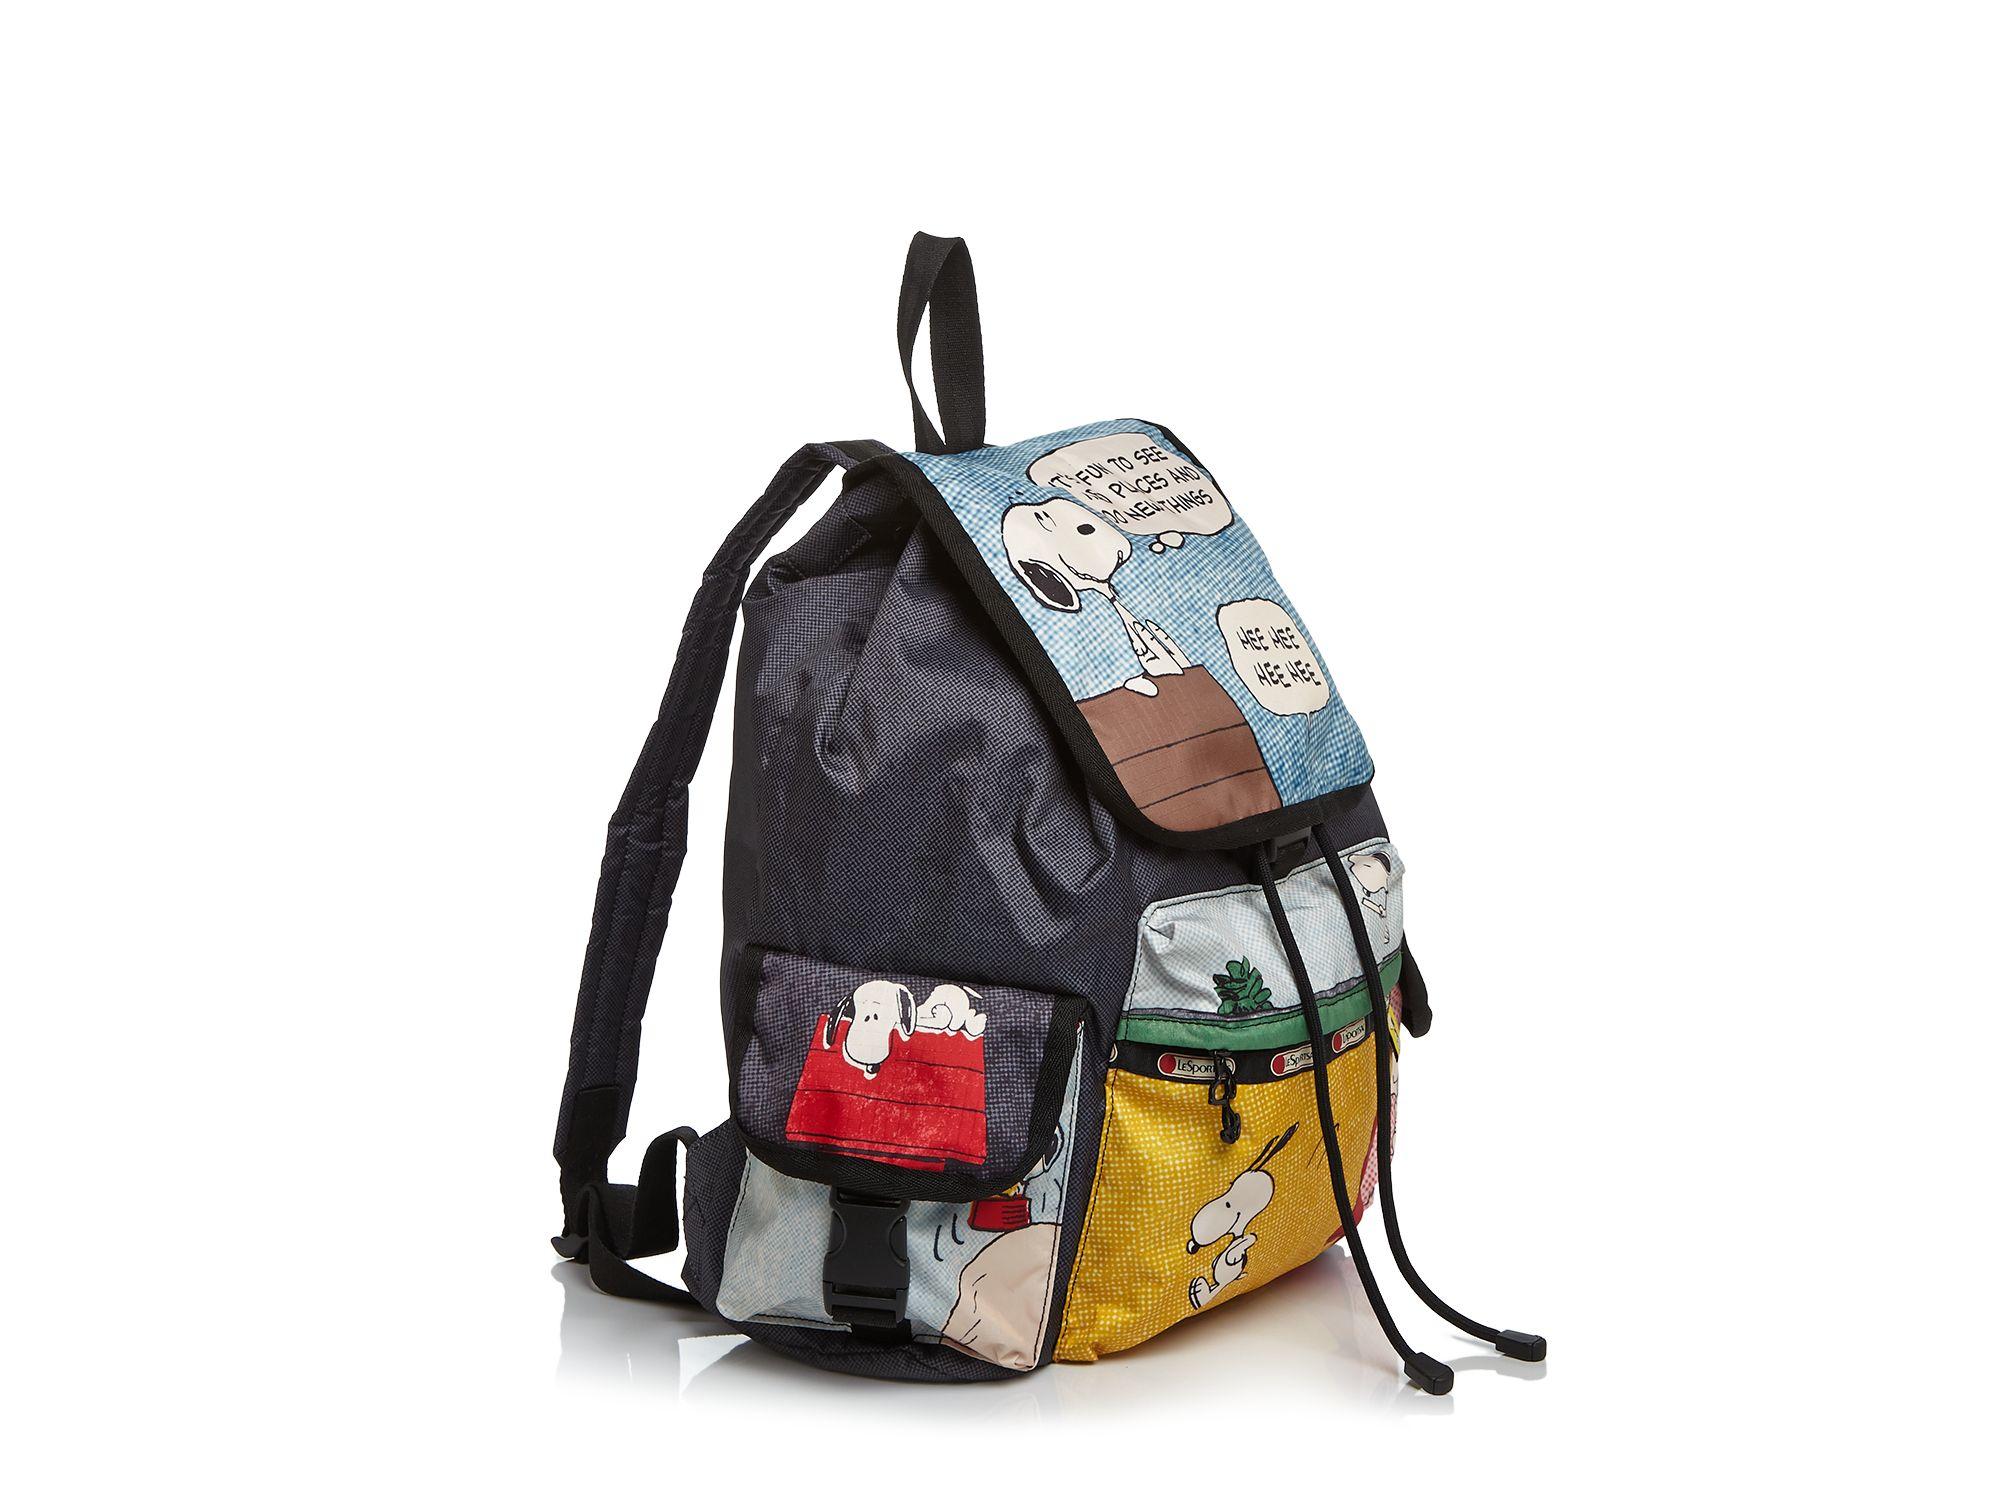 Рюкзак snoopy куплю рюкзак спортивный в беларуси